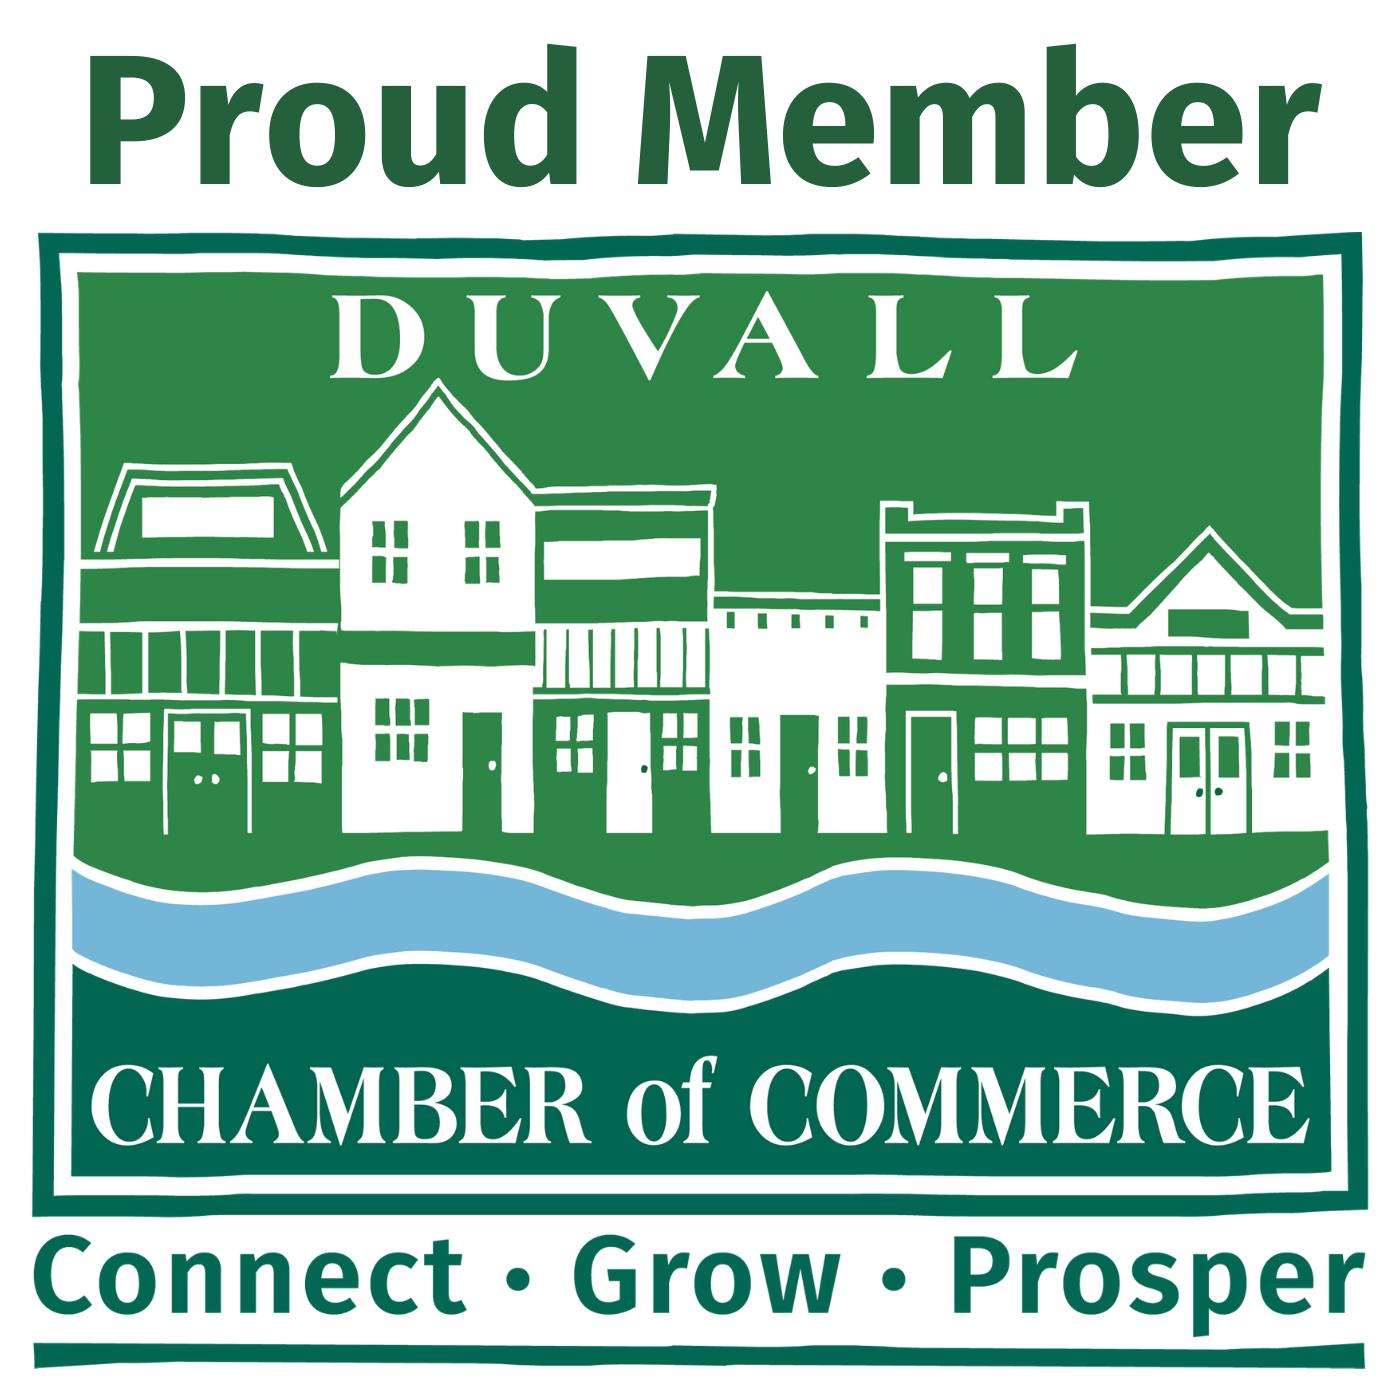 Proud Member of Duvall Chamber -graphic for Member website - large